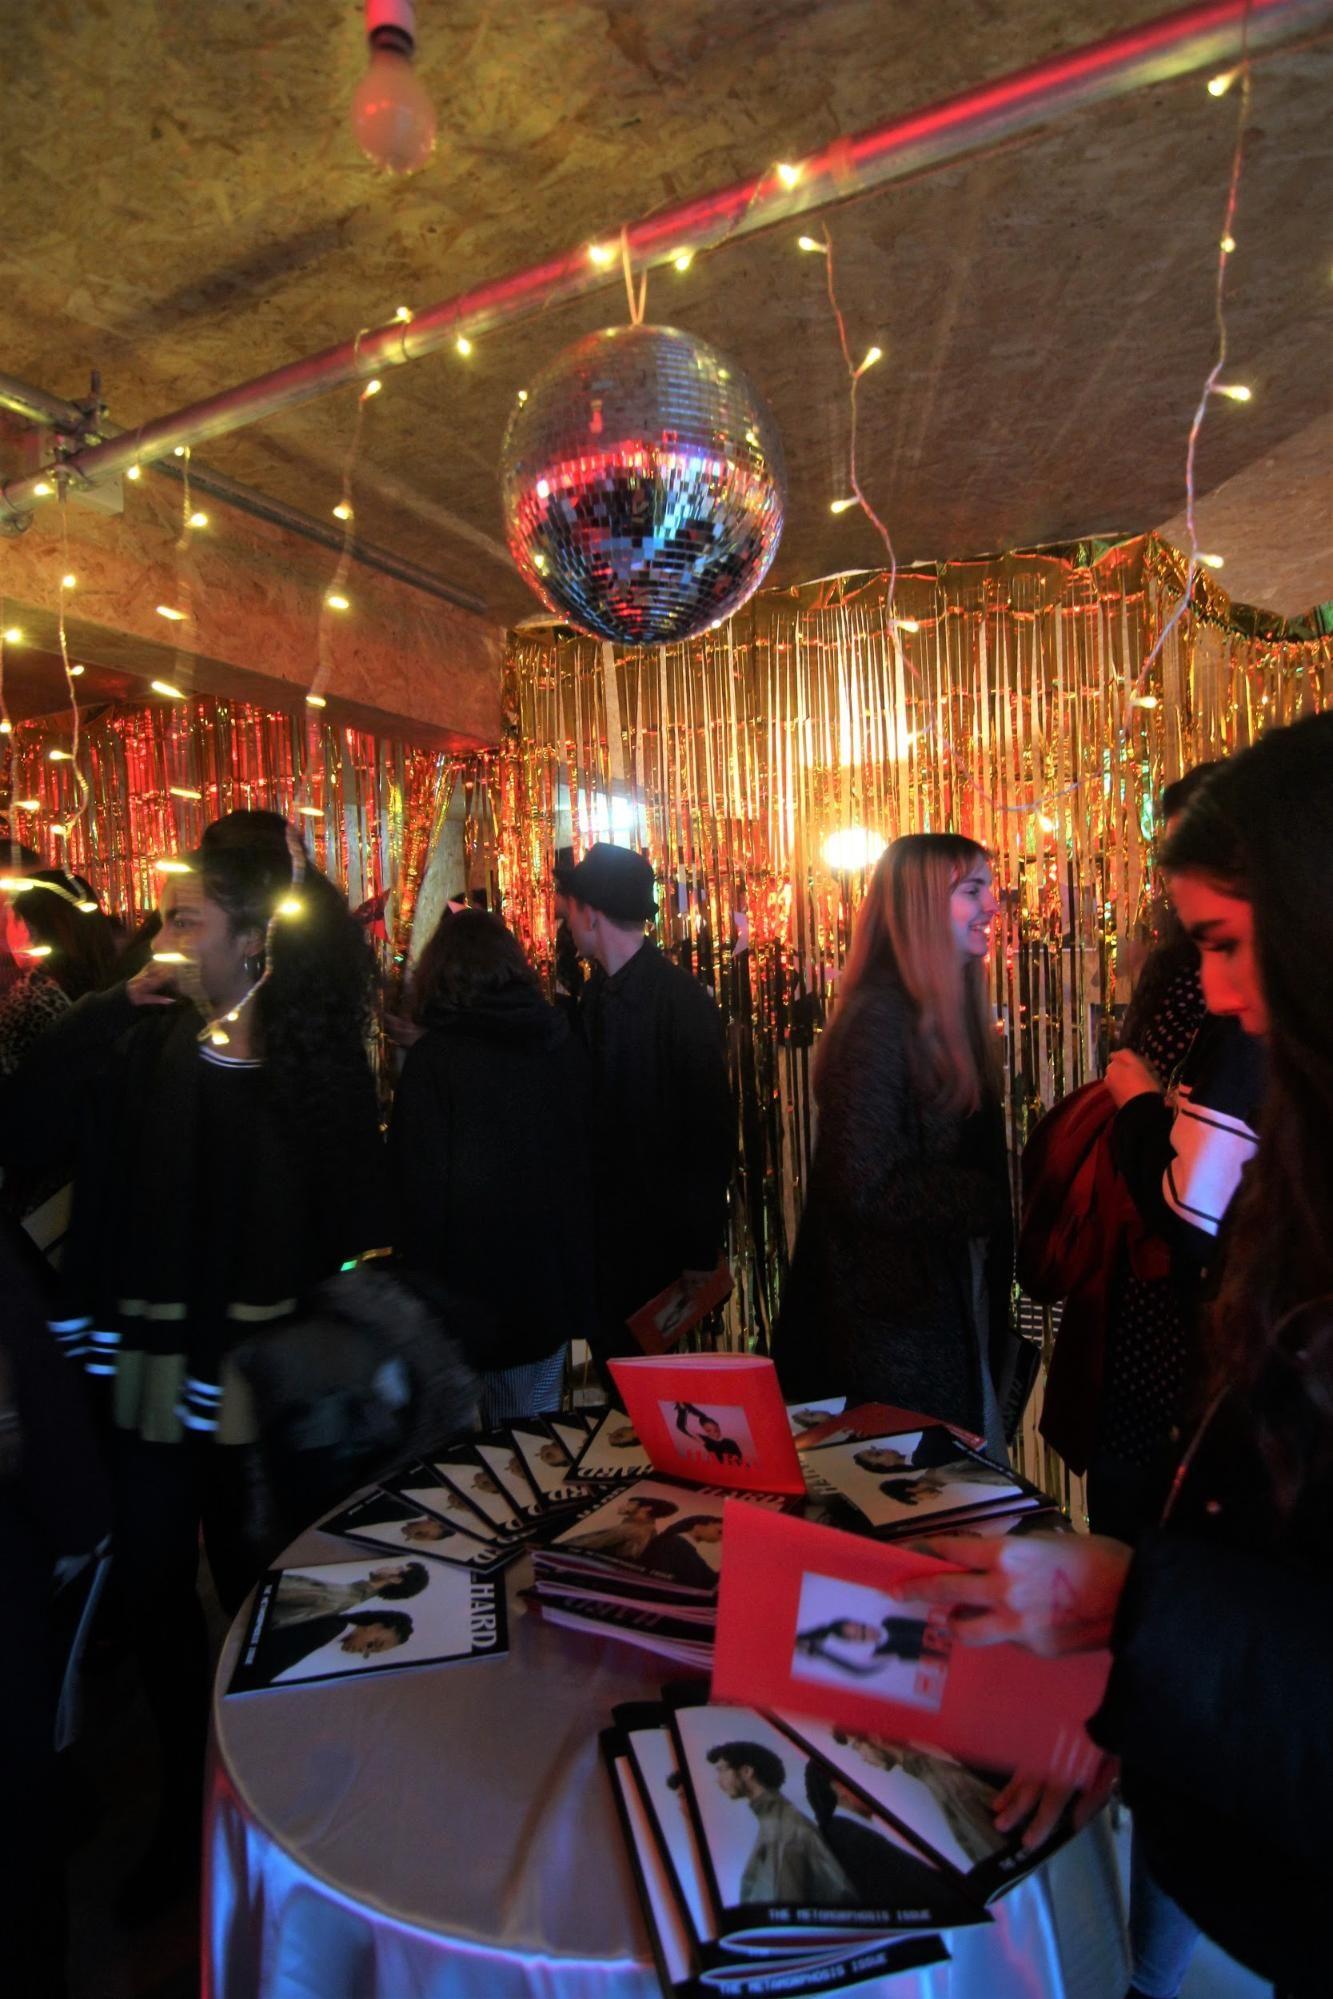 Image may contain: Bazaar, Shop, Market, Crowd, Bar Counter, Pub, Night Club, Club, Lighting, Person, Human, Night Life